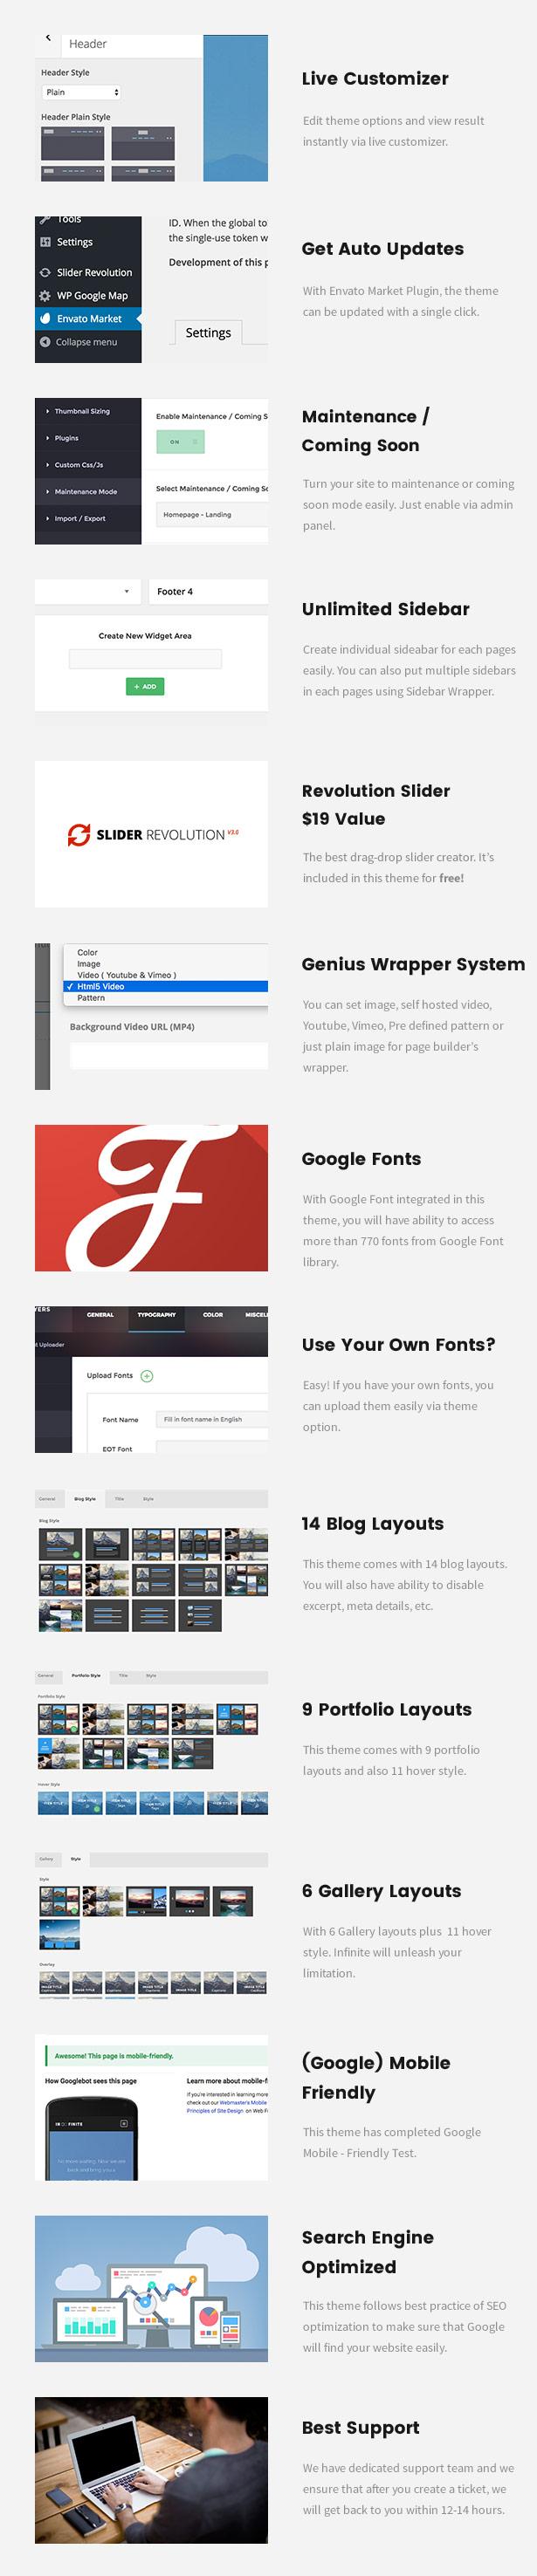 Inteco - Interior & Architecture WordPress Theme - 10